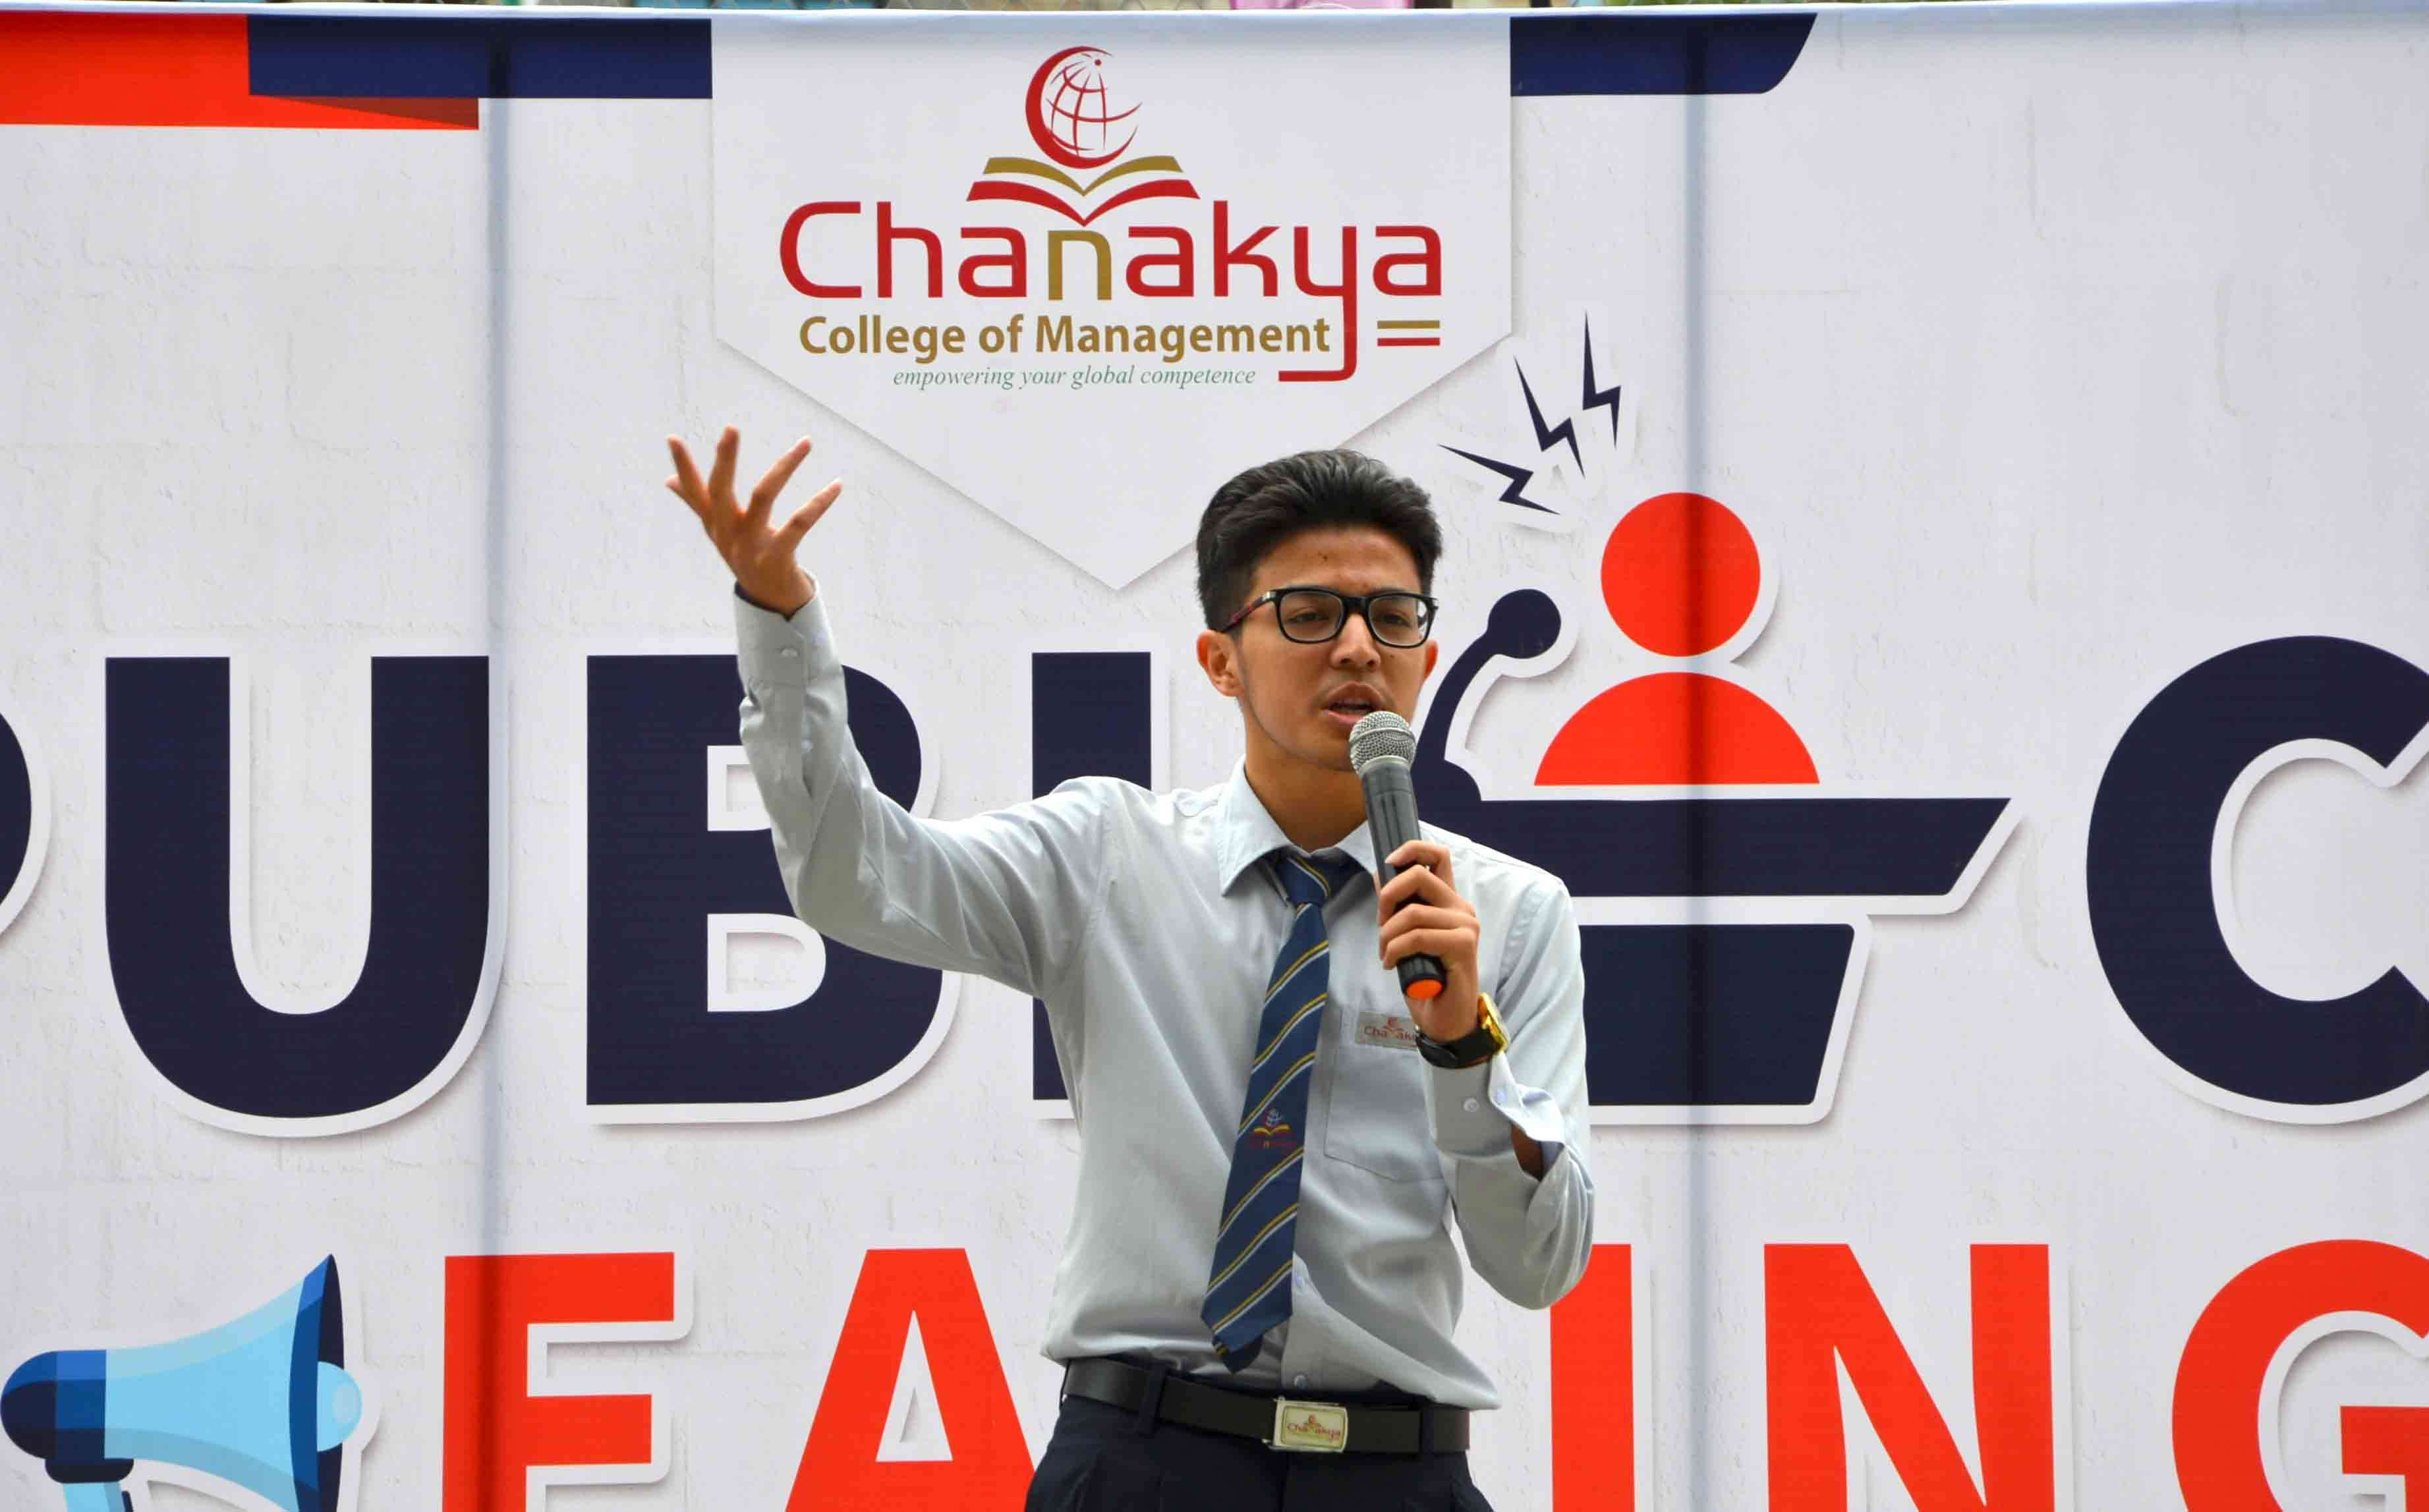 Chanakya College of Management